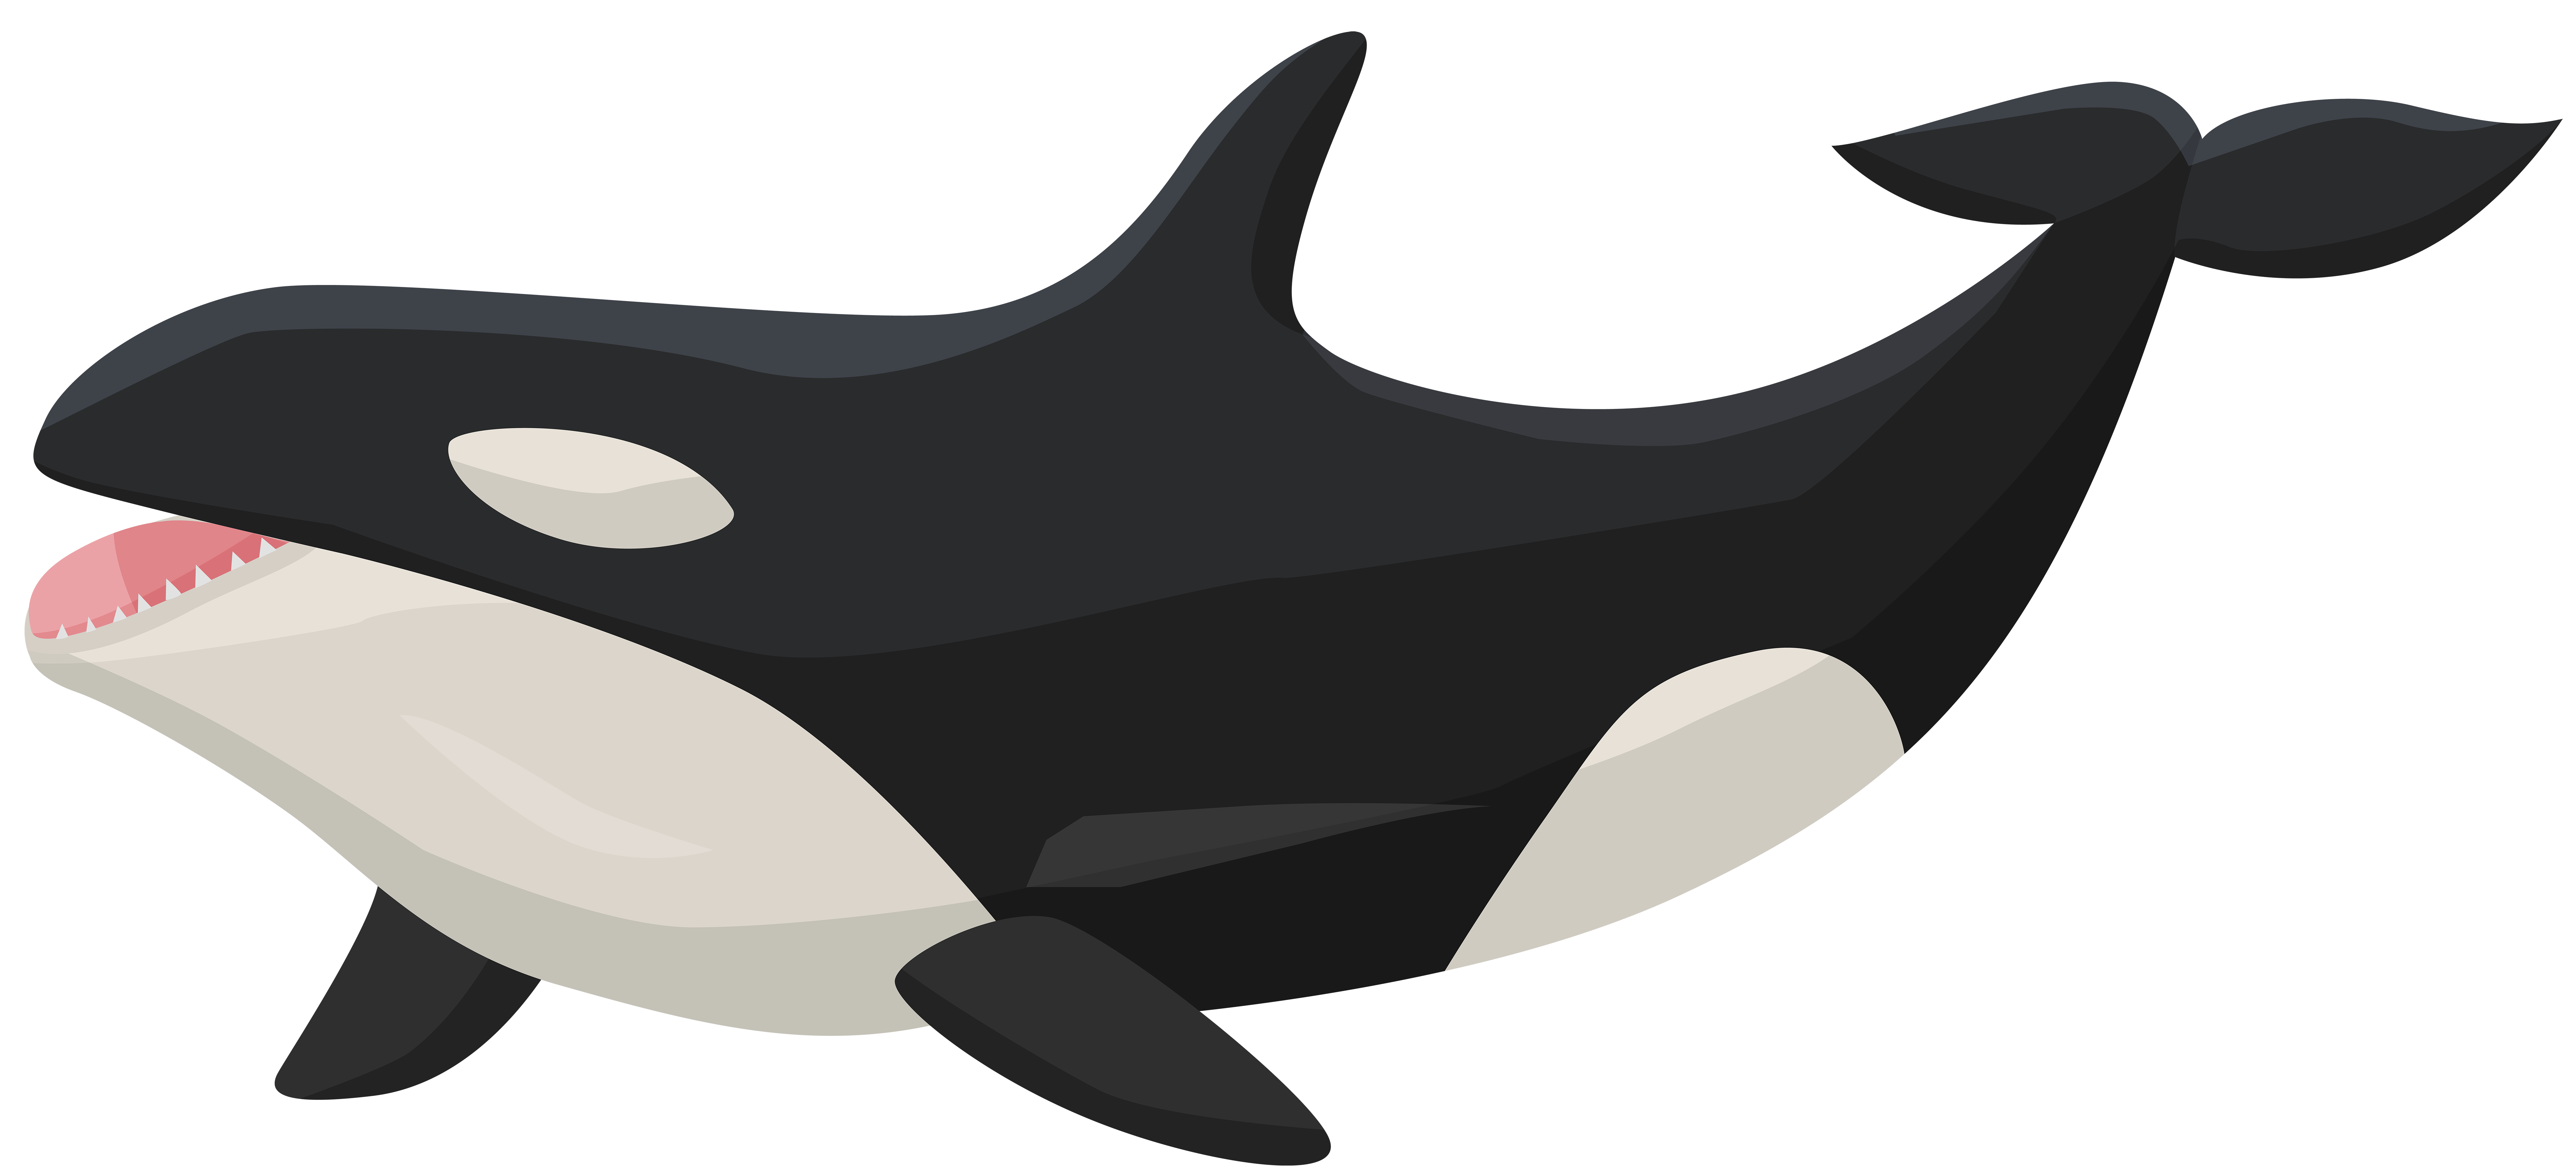 8000x3646 Orca Transparent Png Clip Art Imageu200b Gallery Yopriceville